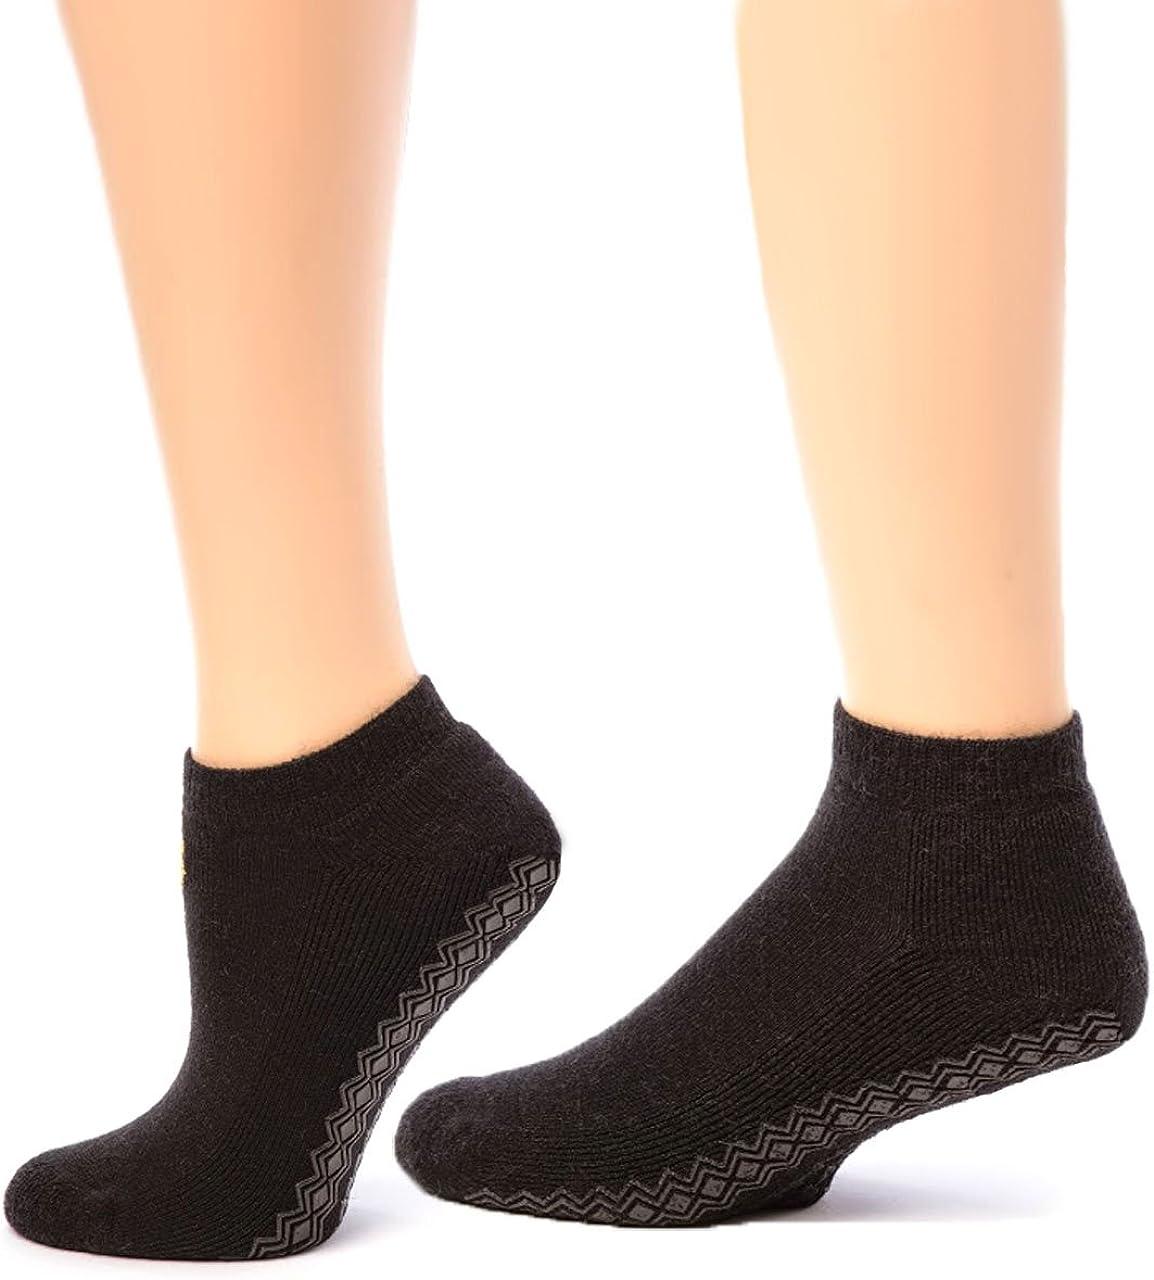 Warrior Alpaca Socks - Women's Non-Skid Mini Crew Alpaca Wool Sock - Ankle High